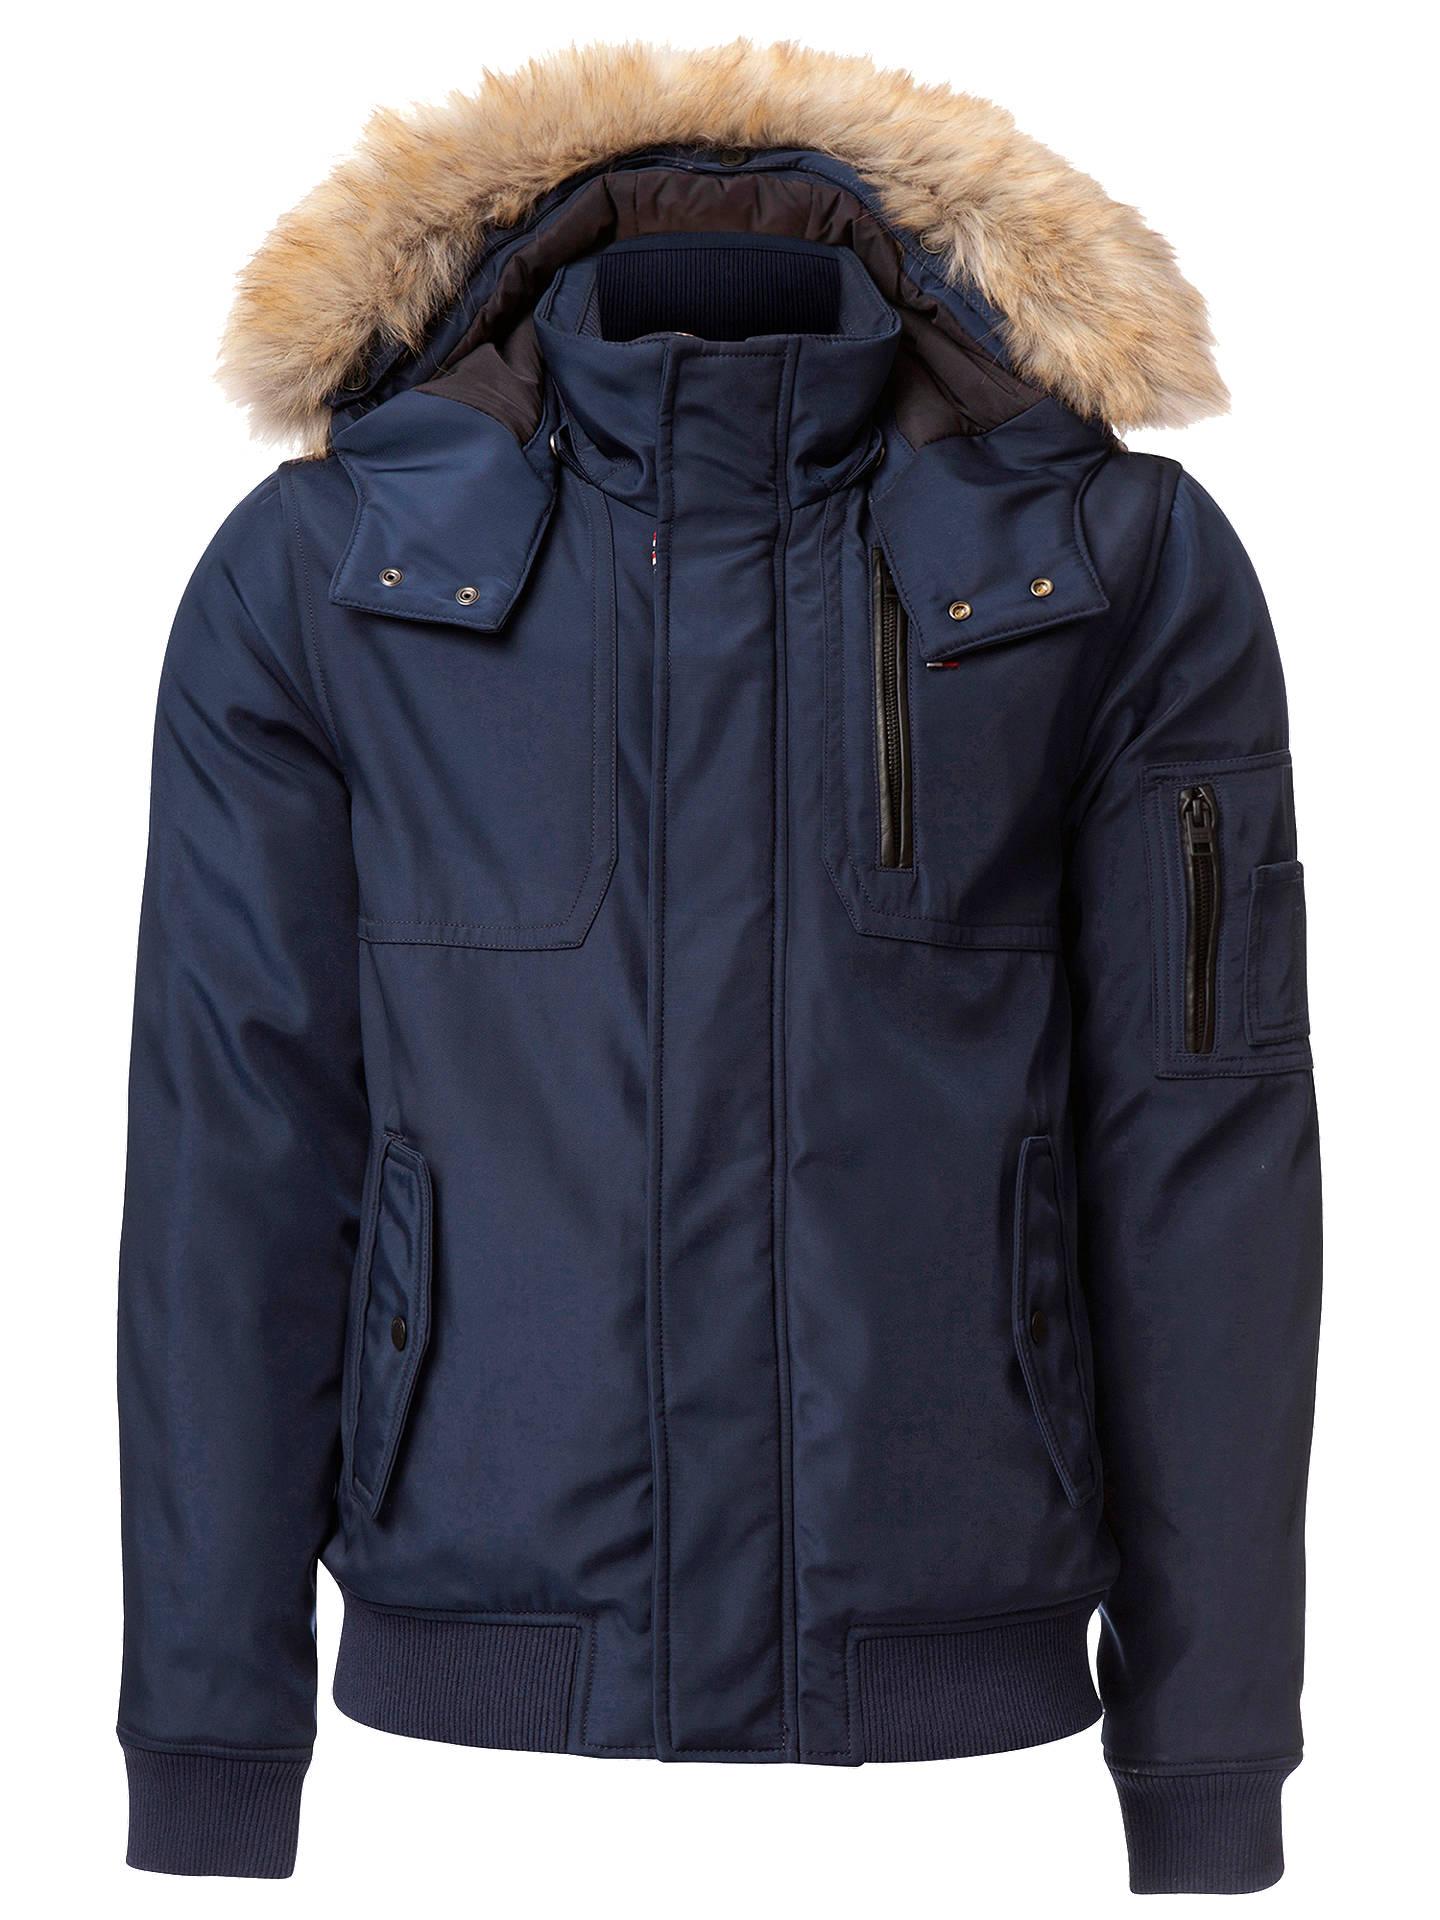 5dfceec3 Buy Tommy Hilfiger Cotton-Blend Hooded Bomber Jacket, Black Iris, S Online  at ...